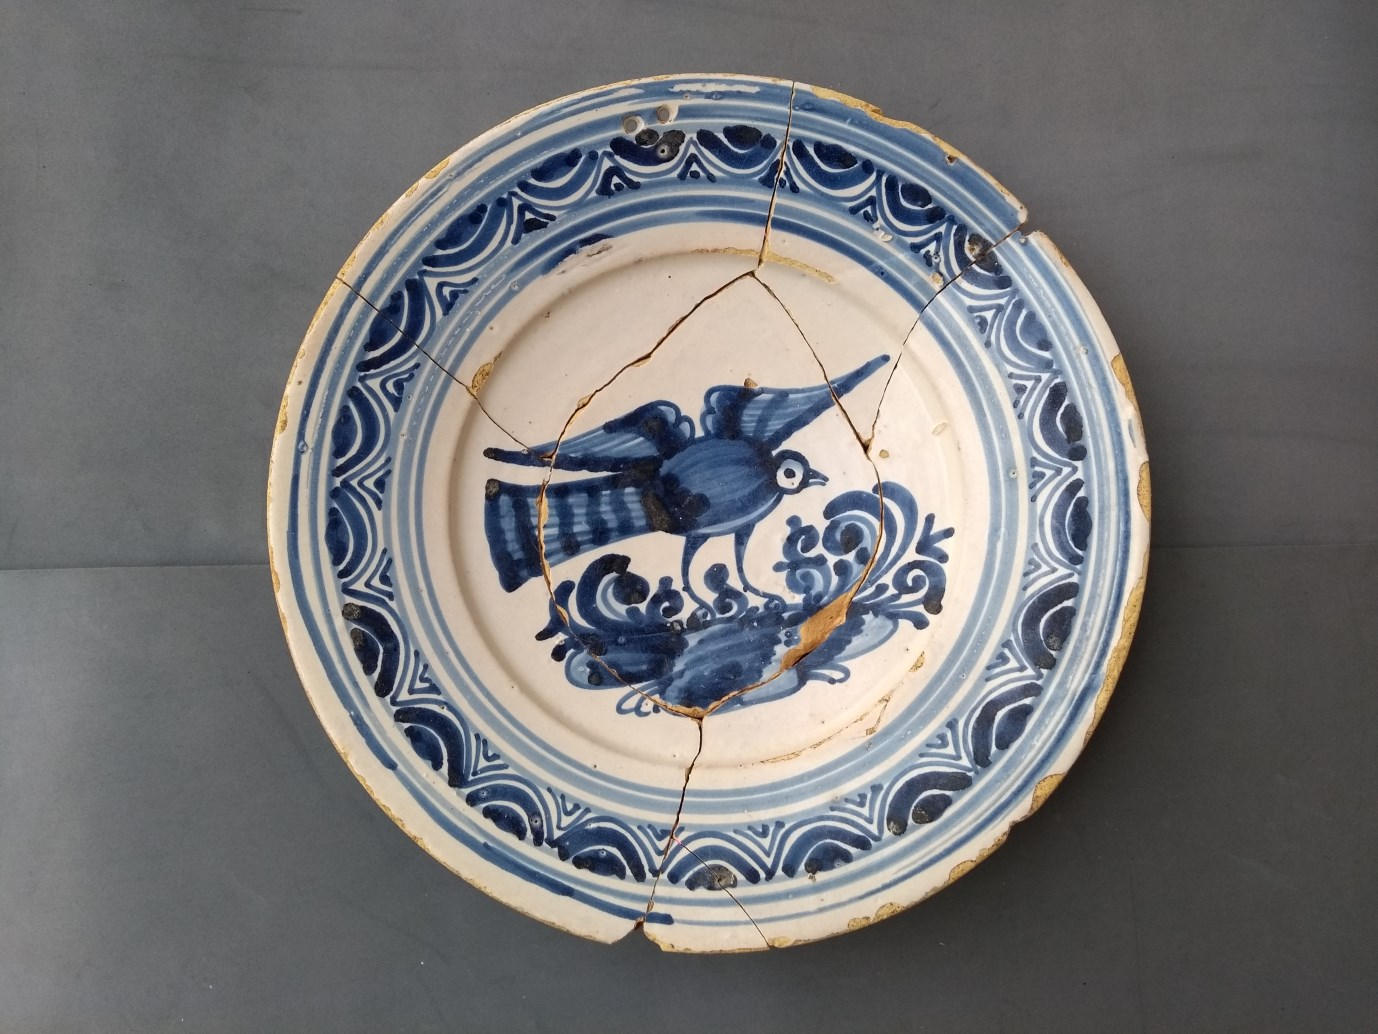 Plat de ceràmica de Poblet, finals segle XVII / inicis segle XVIII. Foto: Jordi Ardiaca